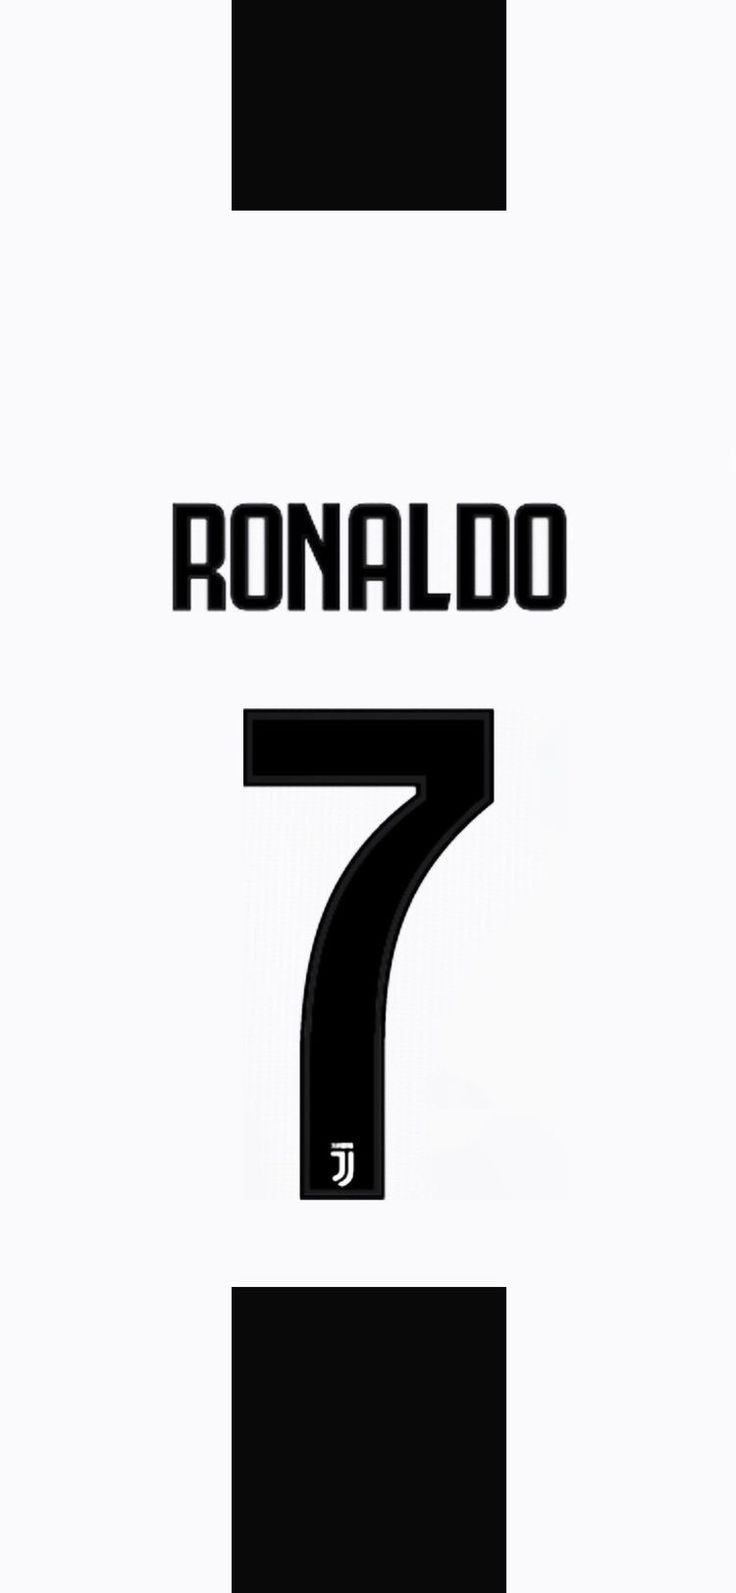 Cristiano Ronaldo Cristiano Ronaldo Wallpapers Ronaldo Wallpapers Cristiano Ronaldo